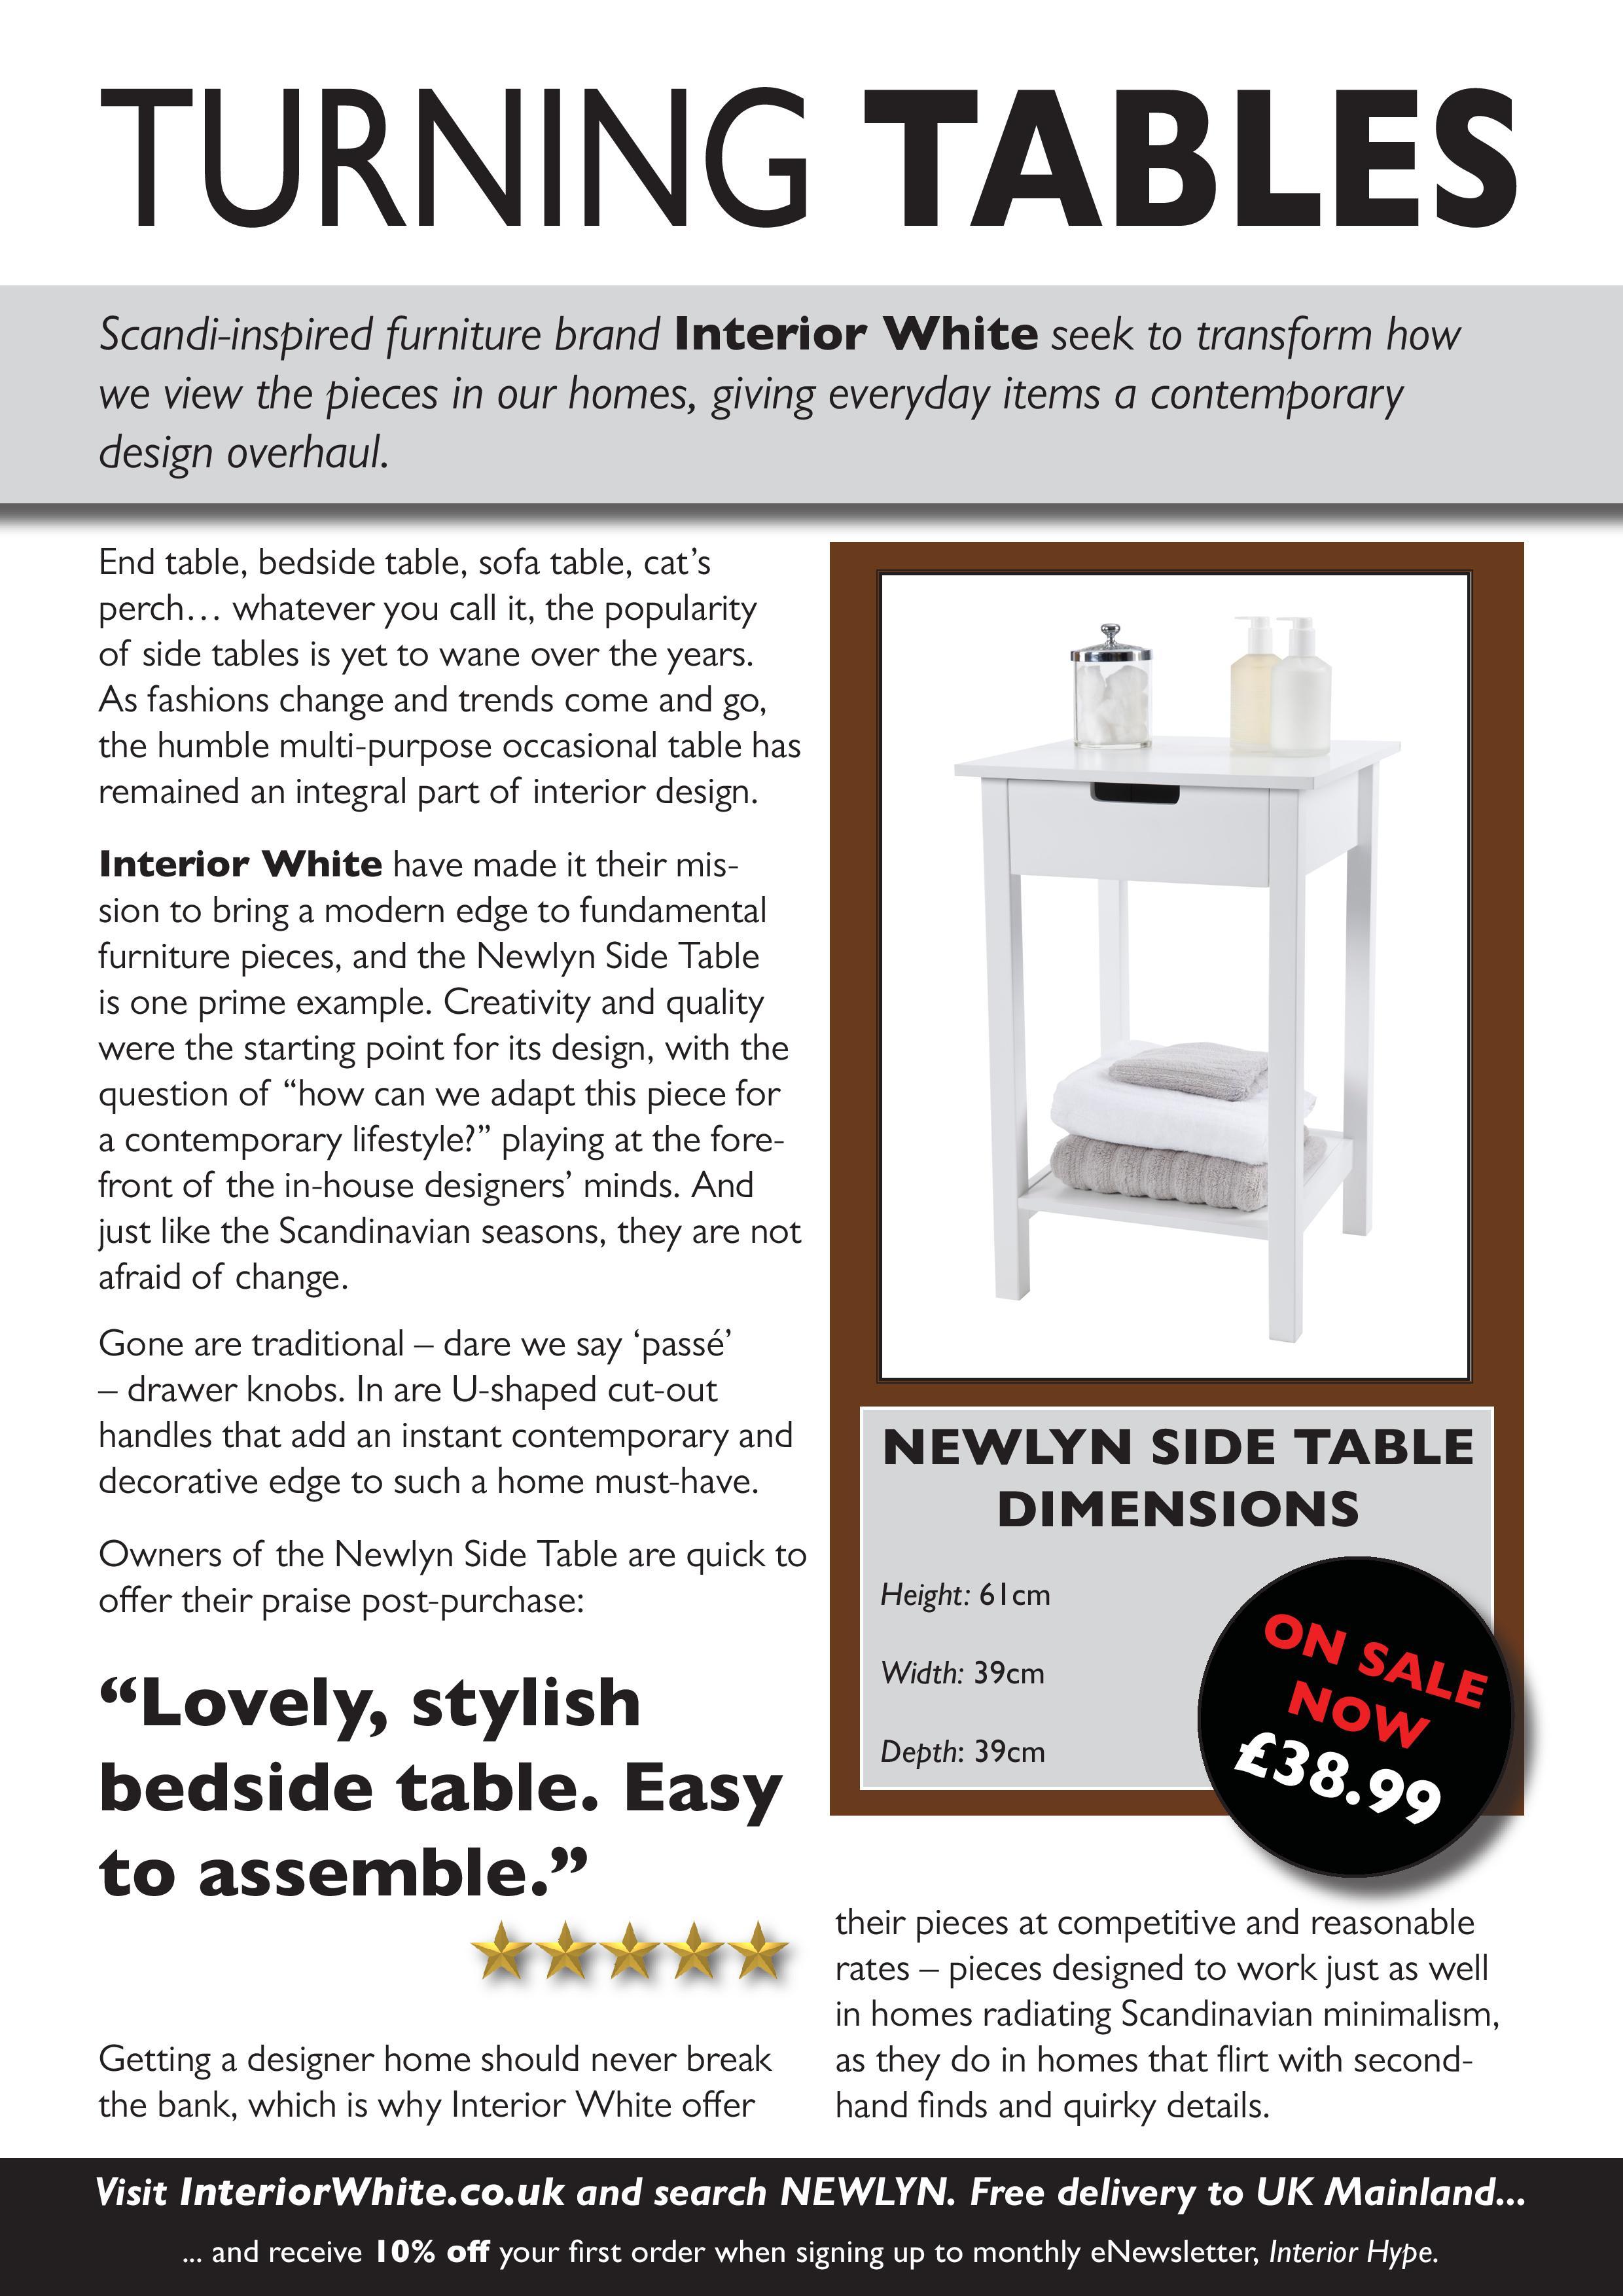 Newlyn Side Table Advertorial-page-001.jpg